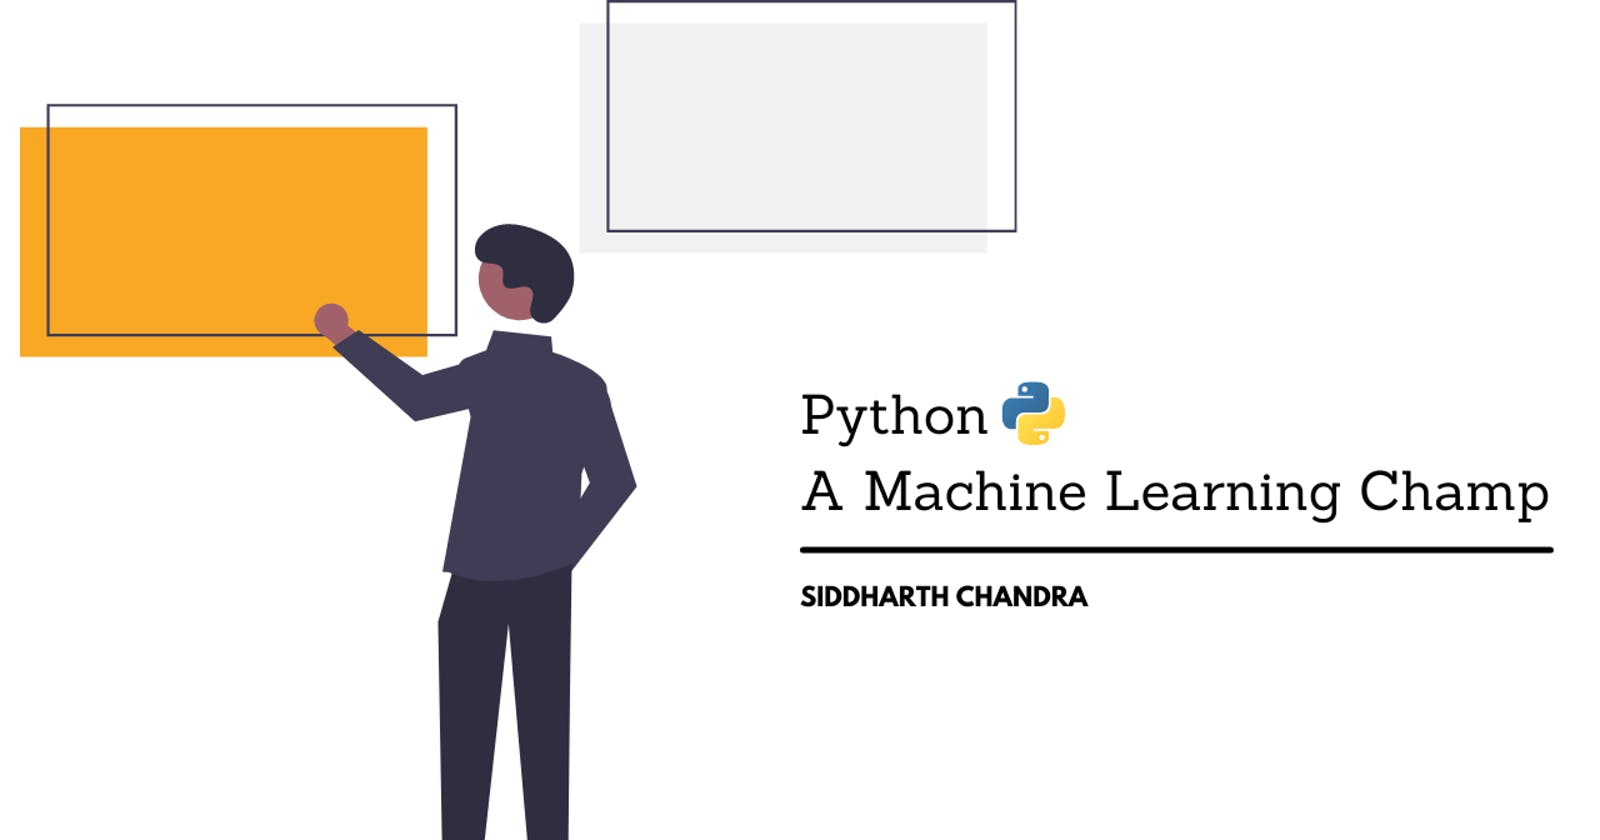 Python - A Machine Learning Champ